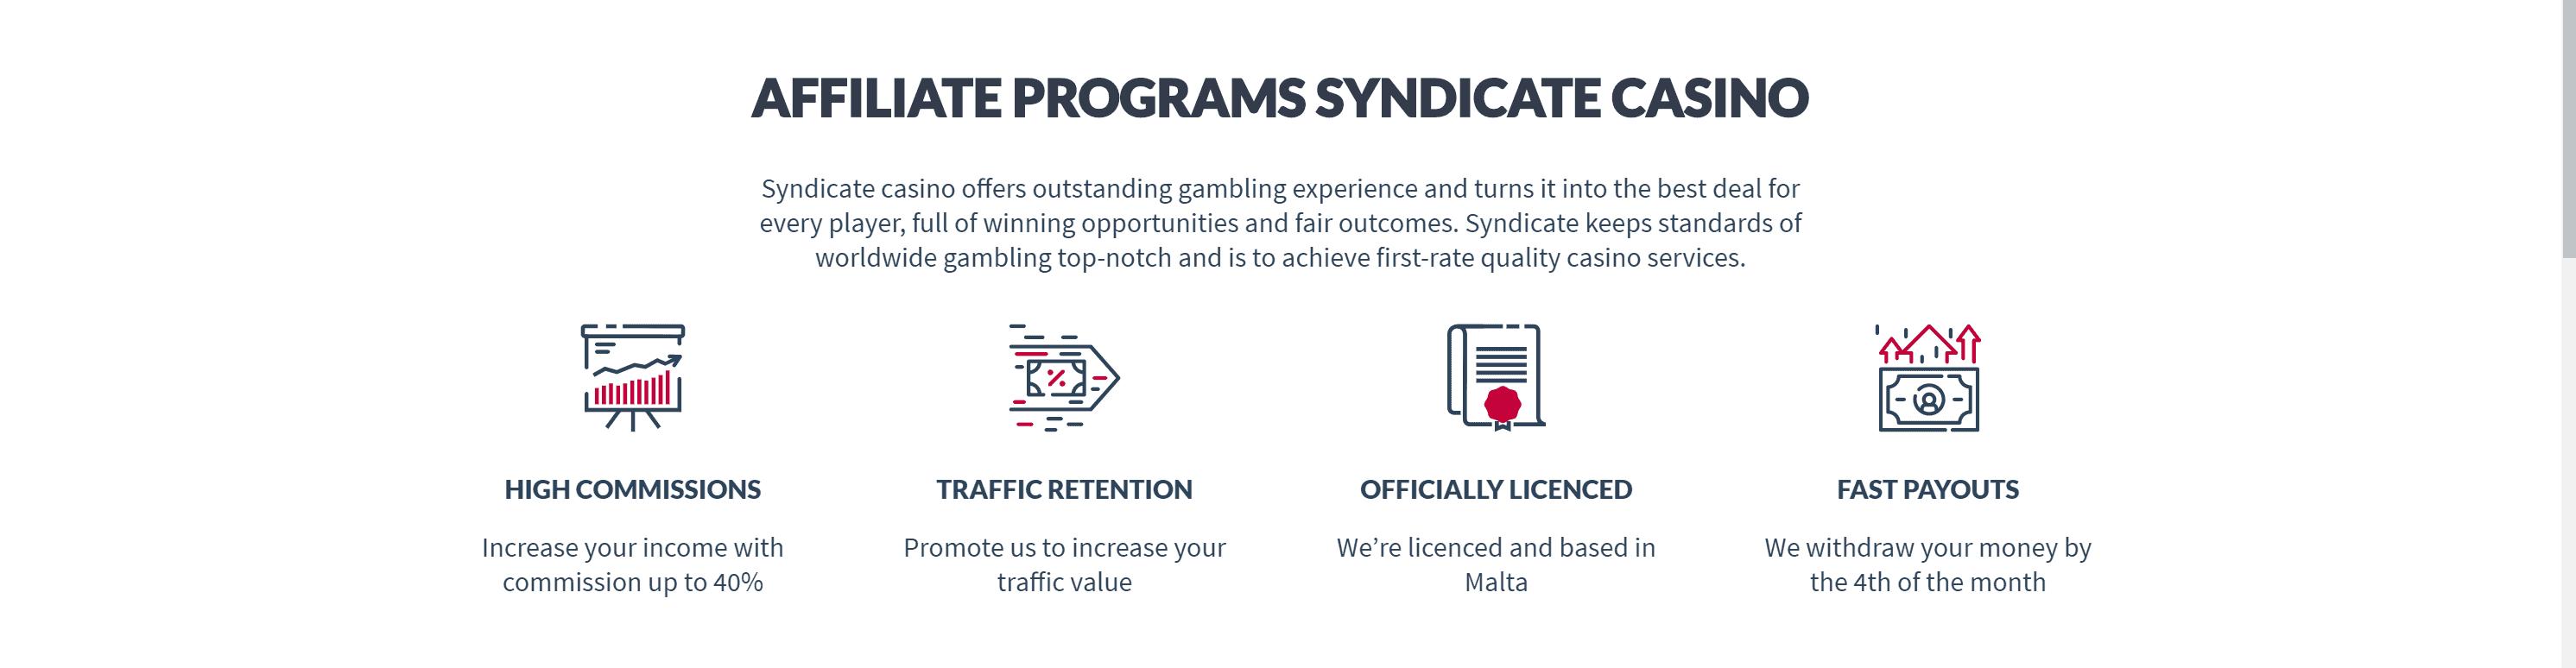 Syndicate Casino revenues